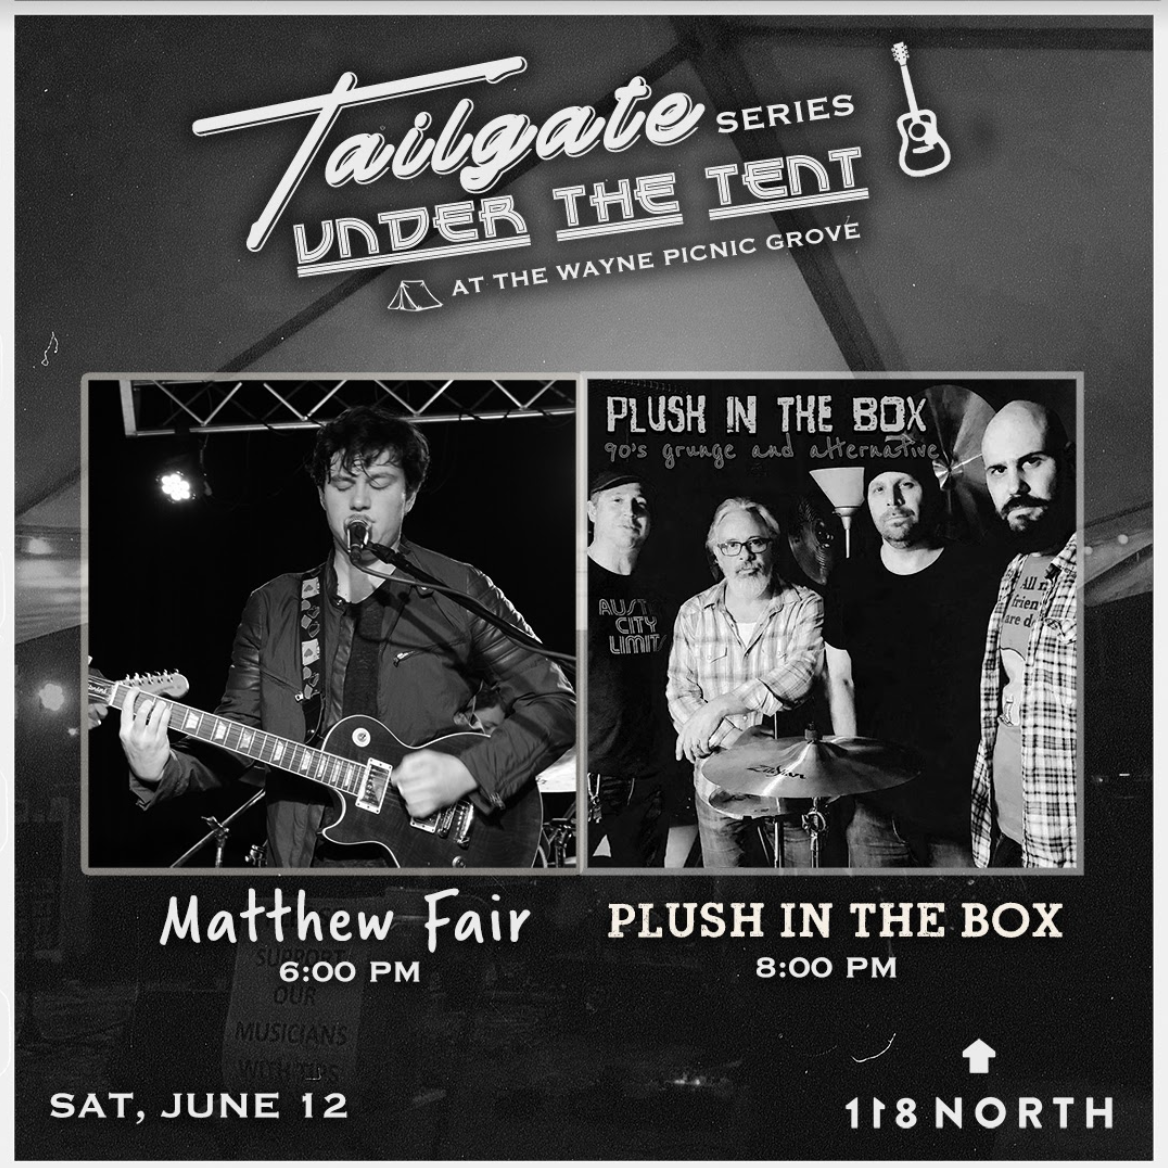 Plush In The Box + Matthew Fair: Main Image